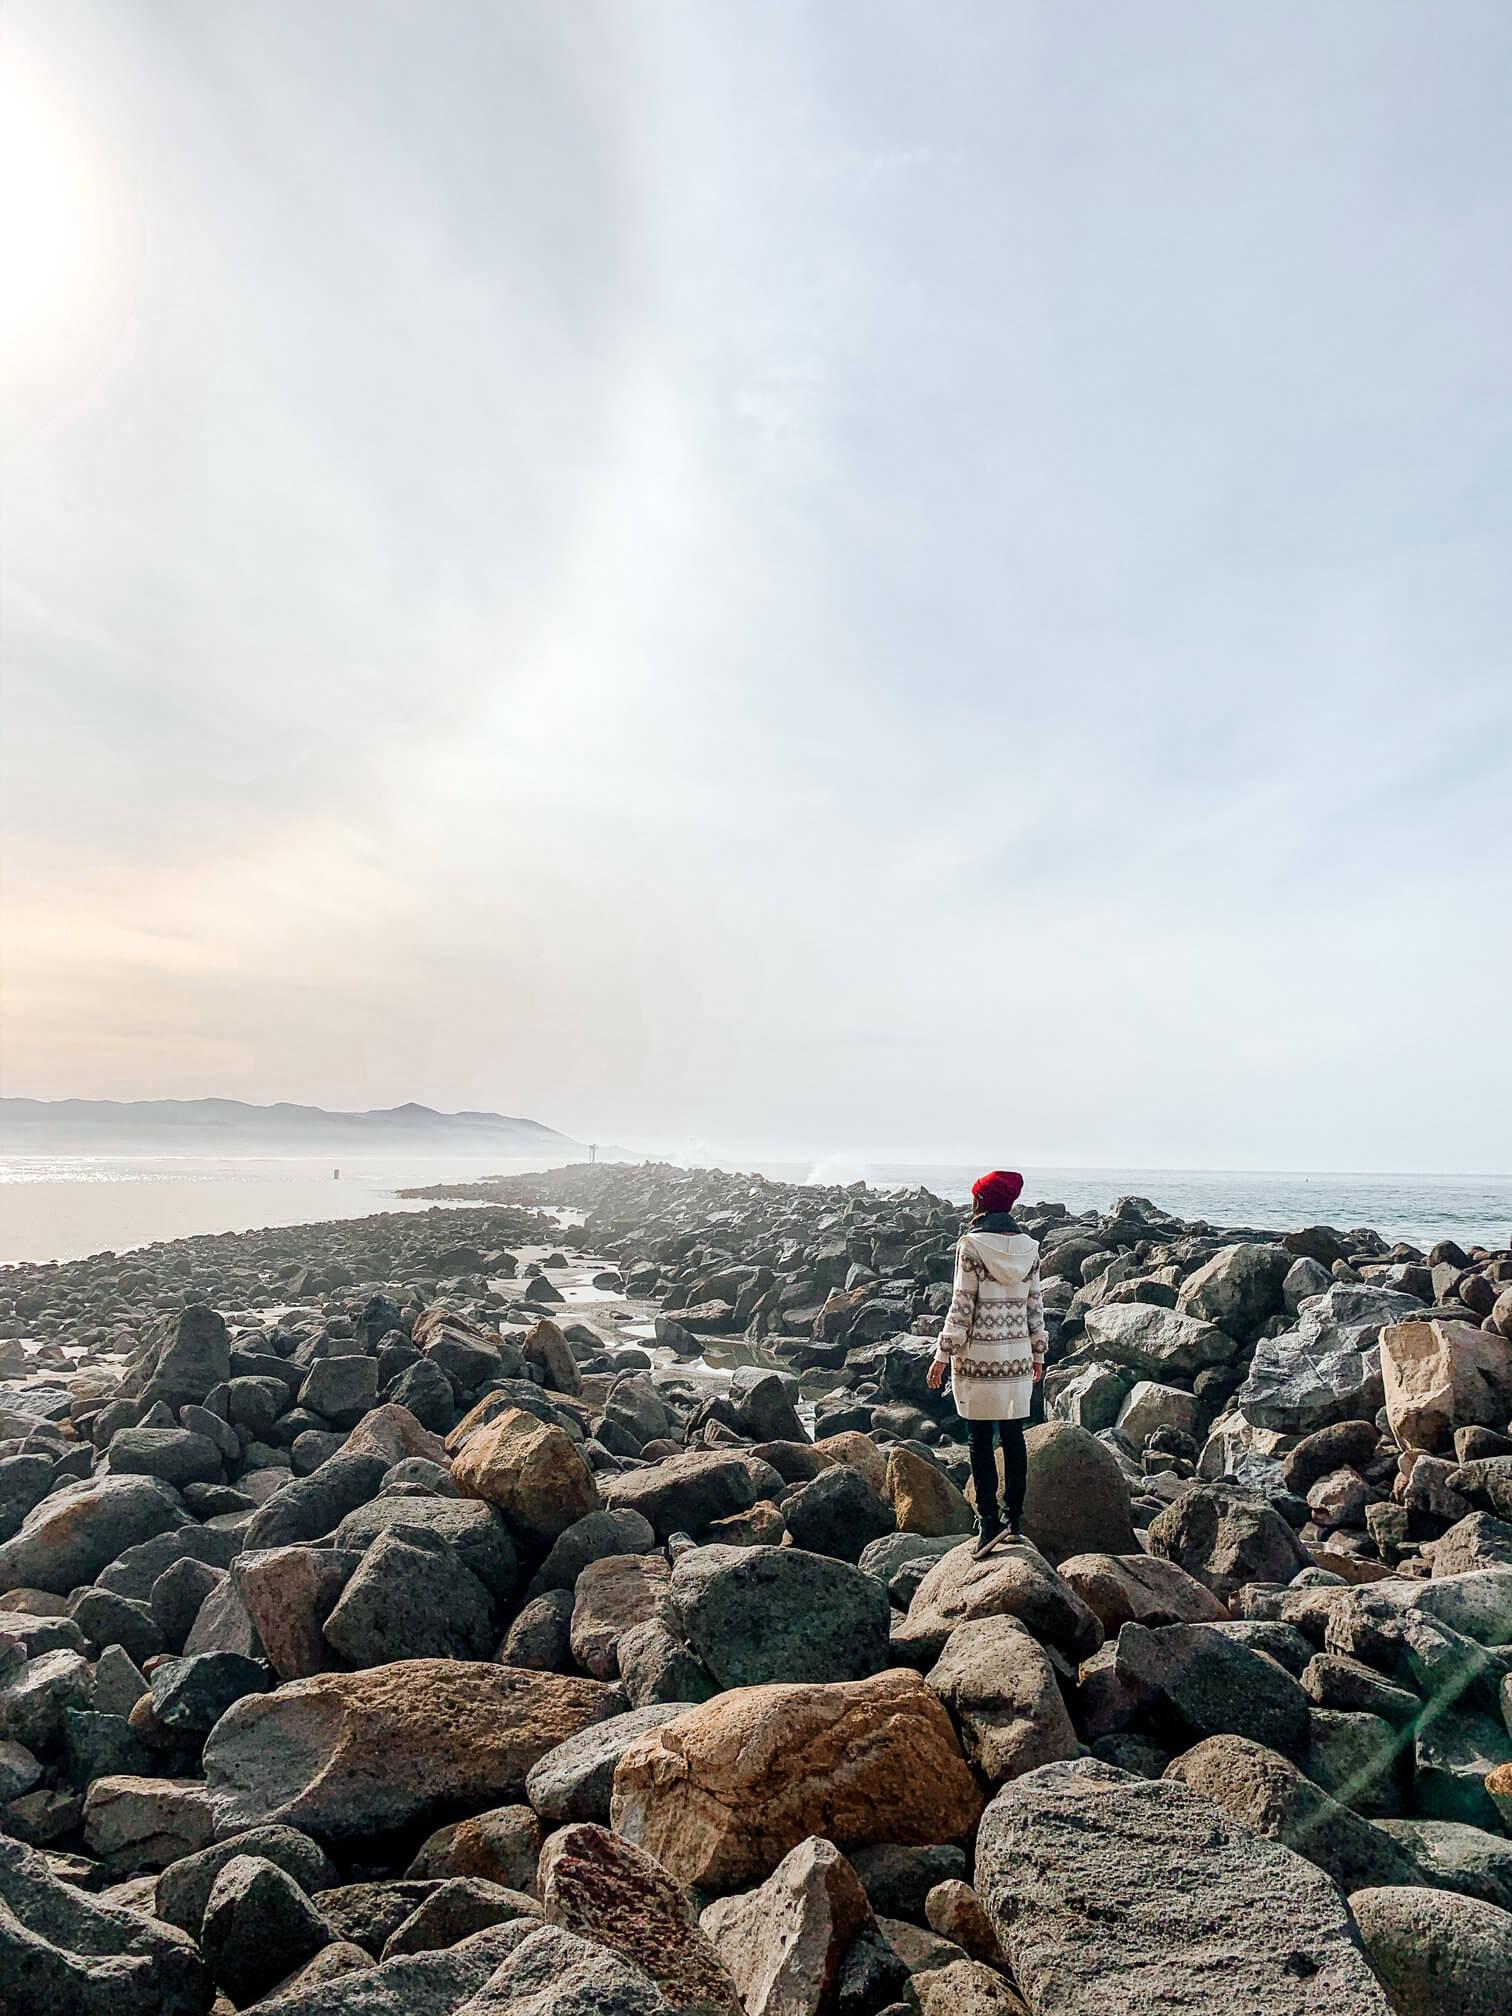 Vivre aux Etats-Unis - Moro Bay en Californie